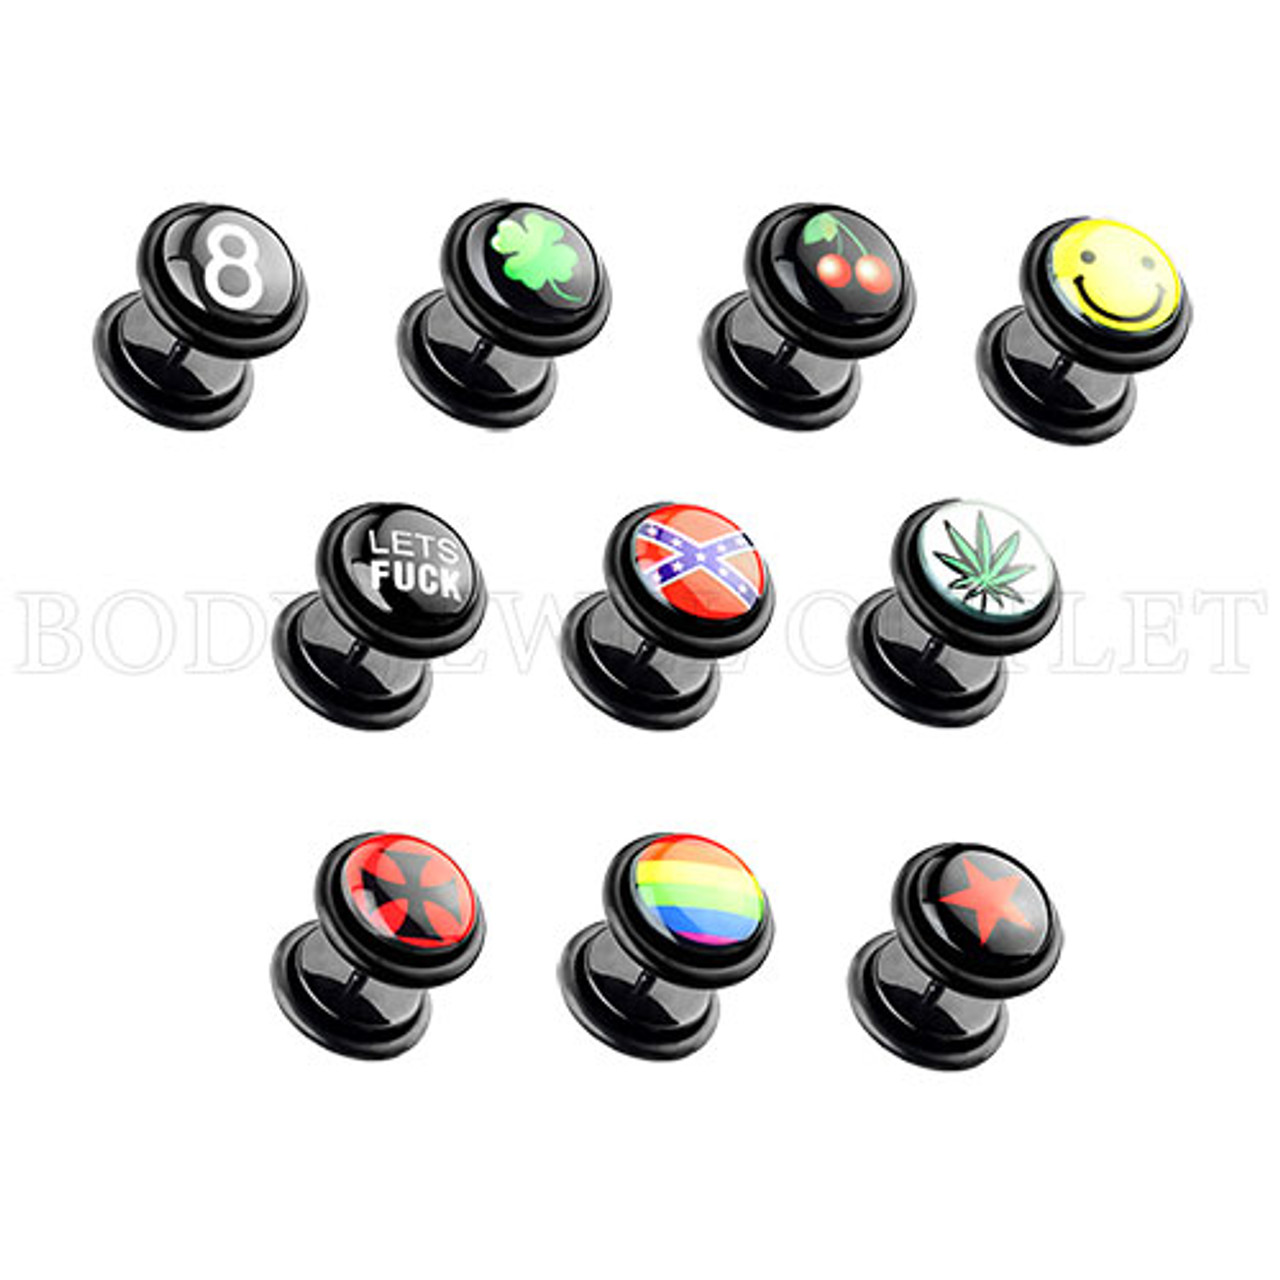 Logo Rebel Flag - Acrylic Fake Plug - 00G Look - Screw On Earrings - Pair (2 pieces)